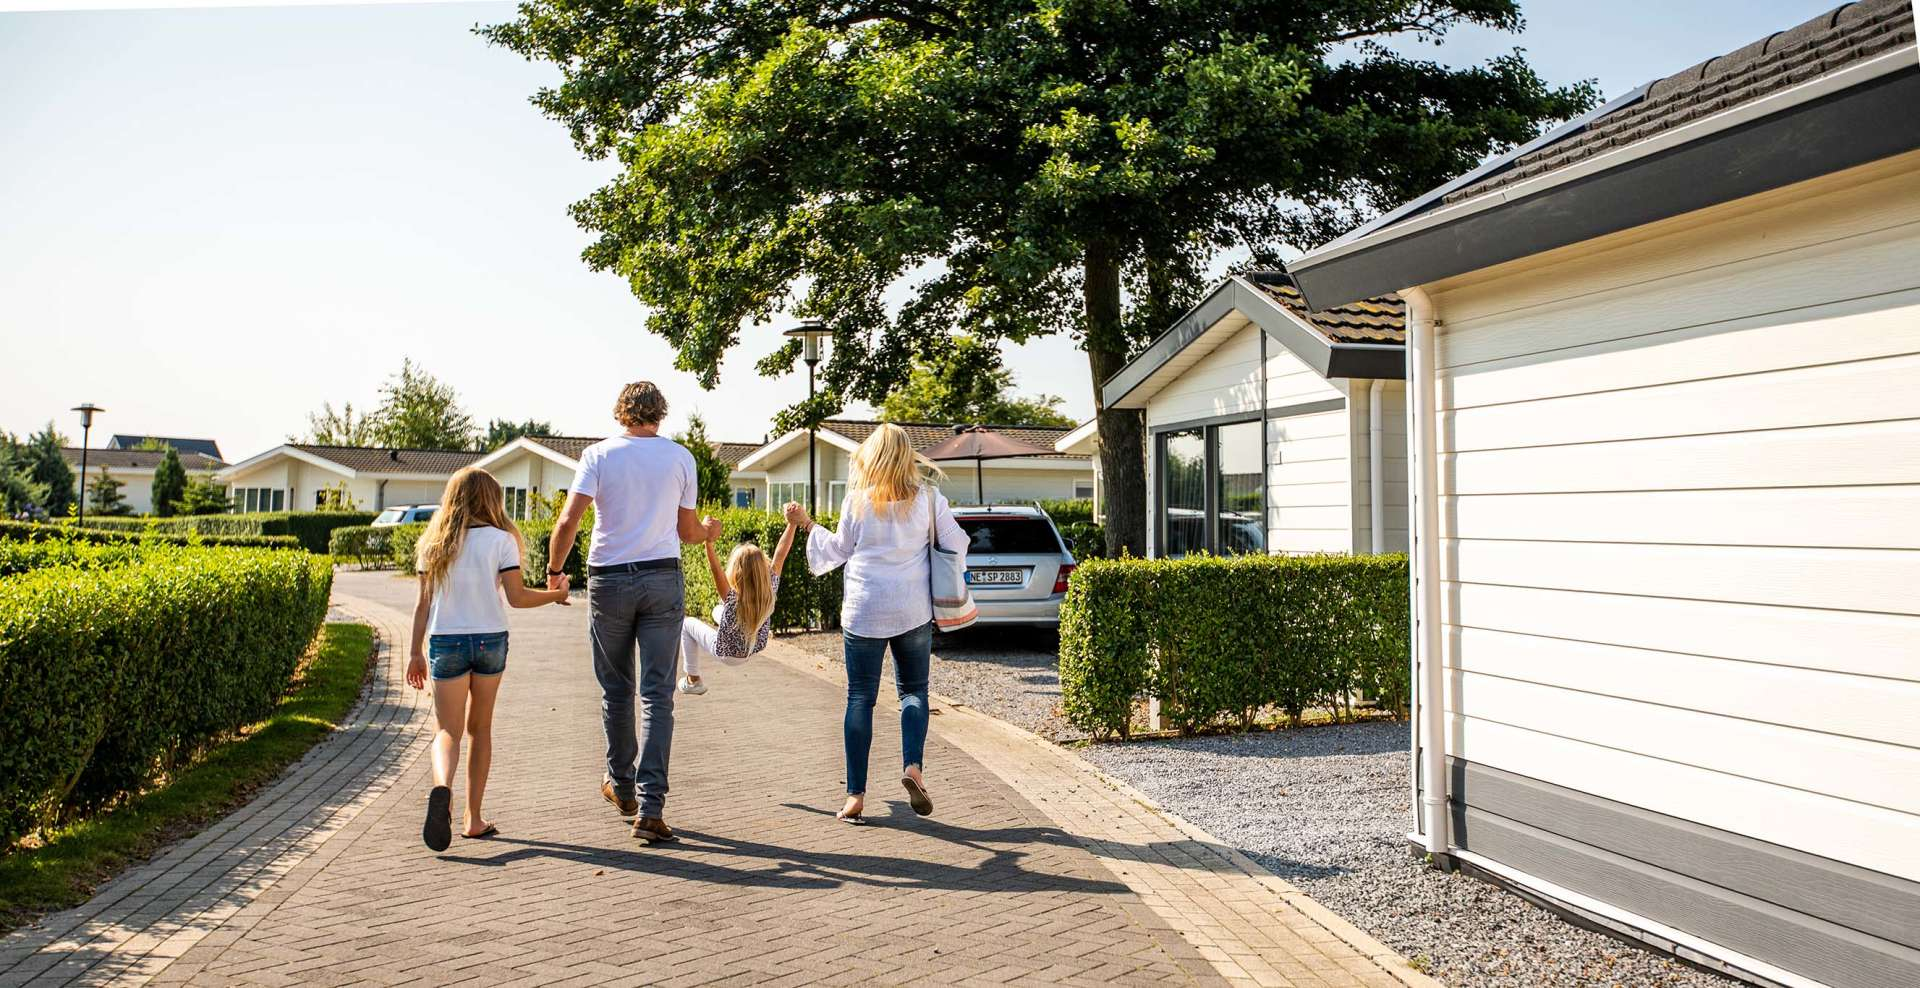 header-family-walking-europarcs-parc-du-soleil